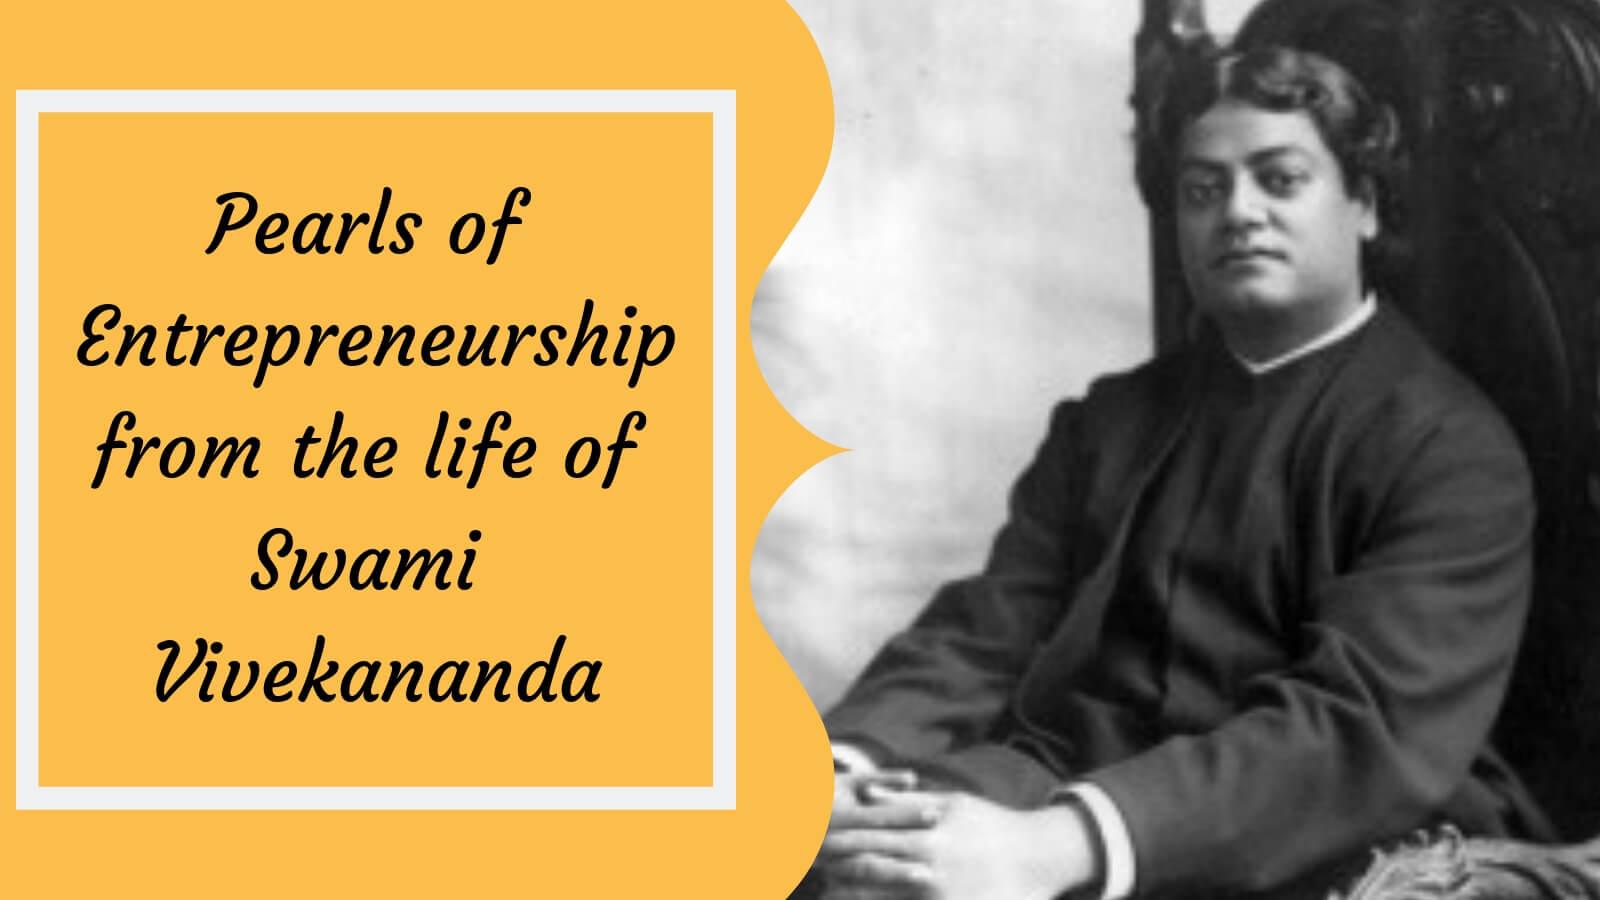 pearls of entrepreneurship naveen lakkur